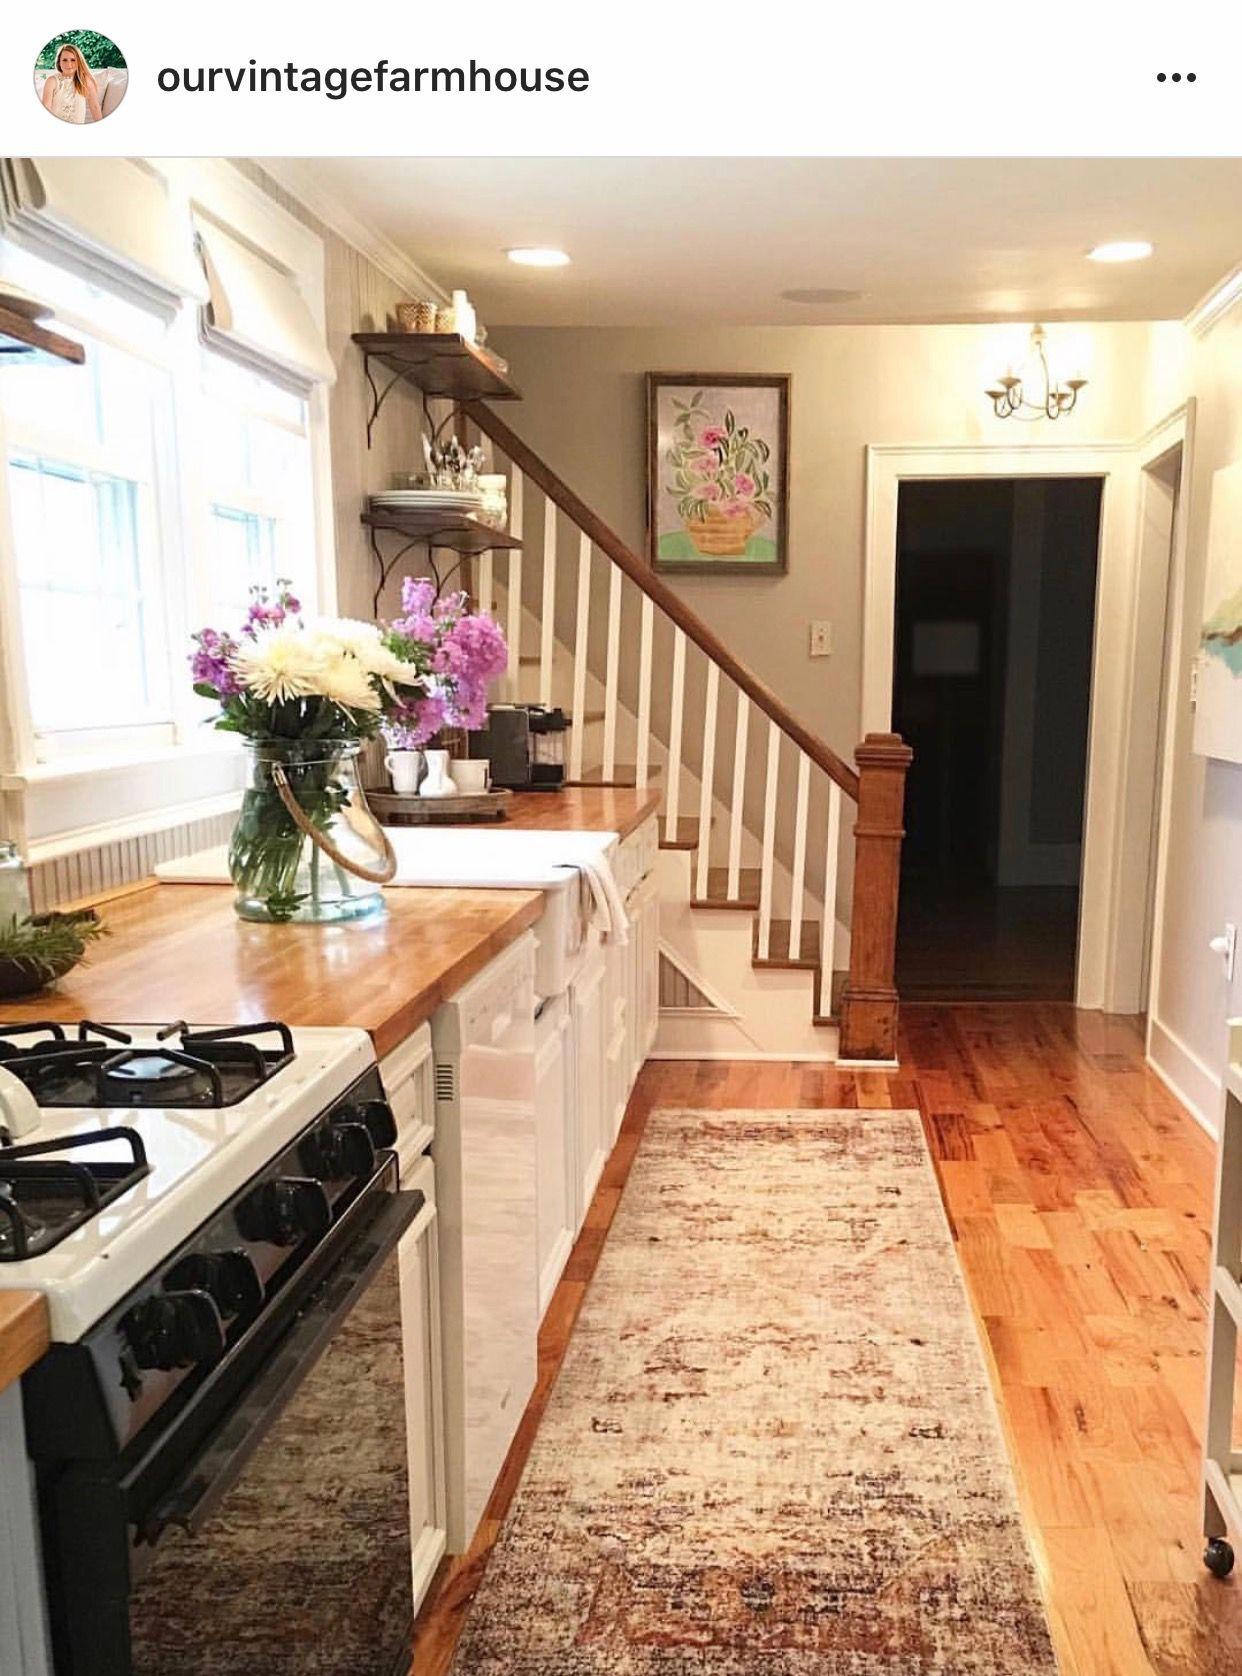 pin by kim on interiors kitchens kitchen interior interior design art vintage farmhouse on kitchen interior classic id=71537